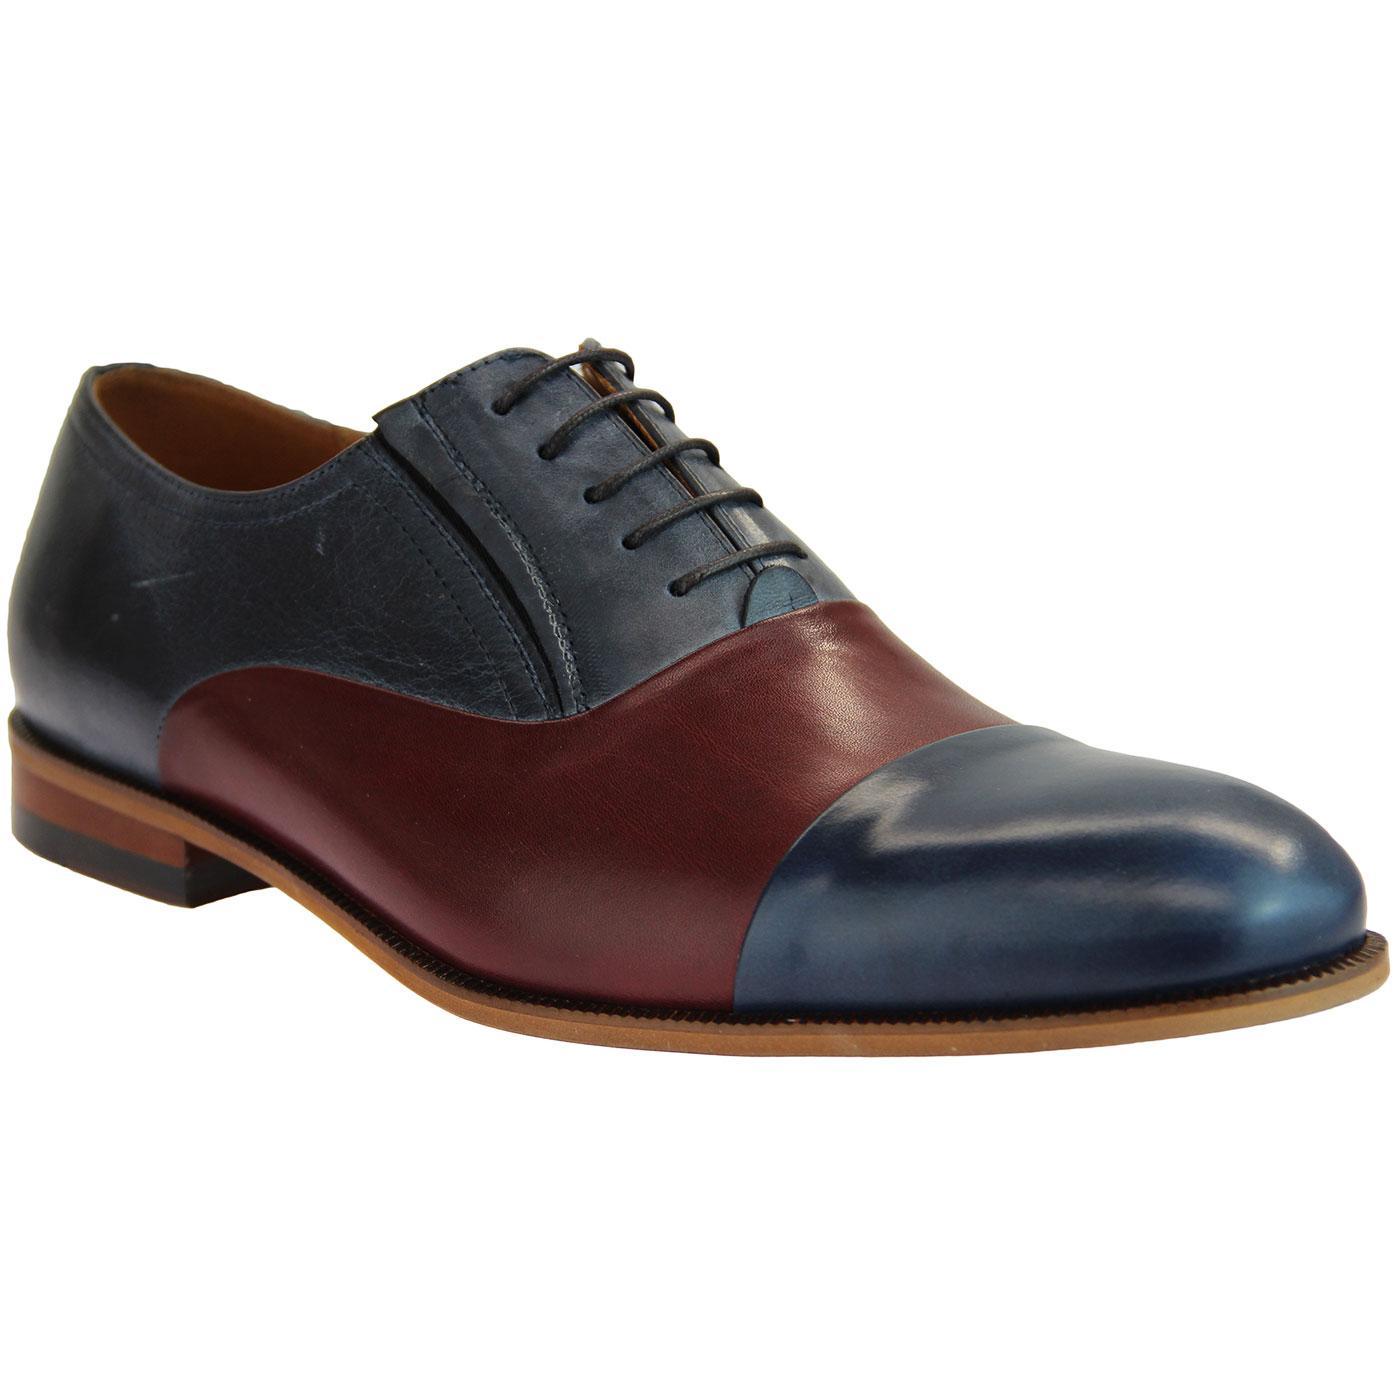 LACUZZO Retro 60s Spatz Style Smart Oxford Shoes